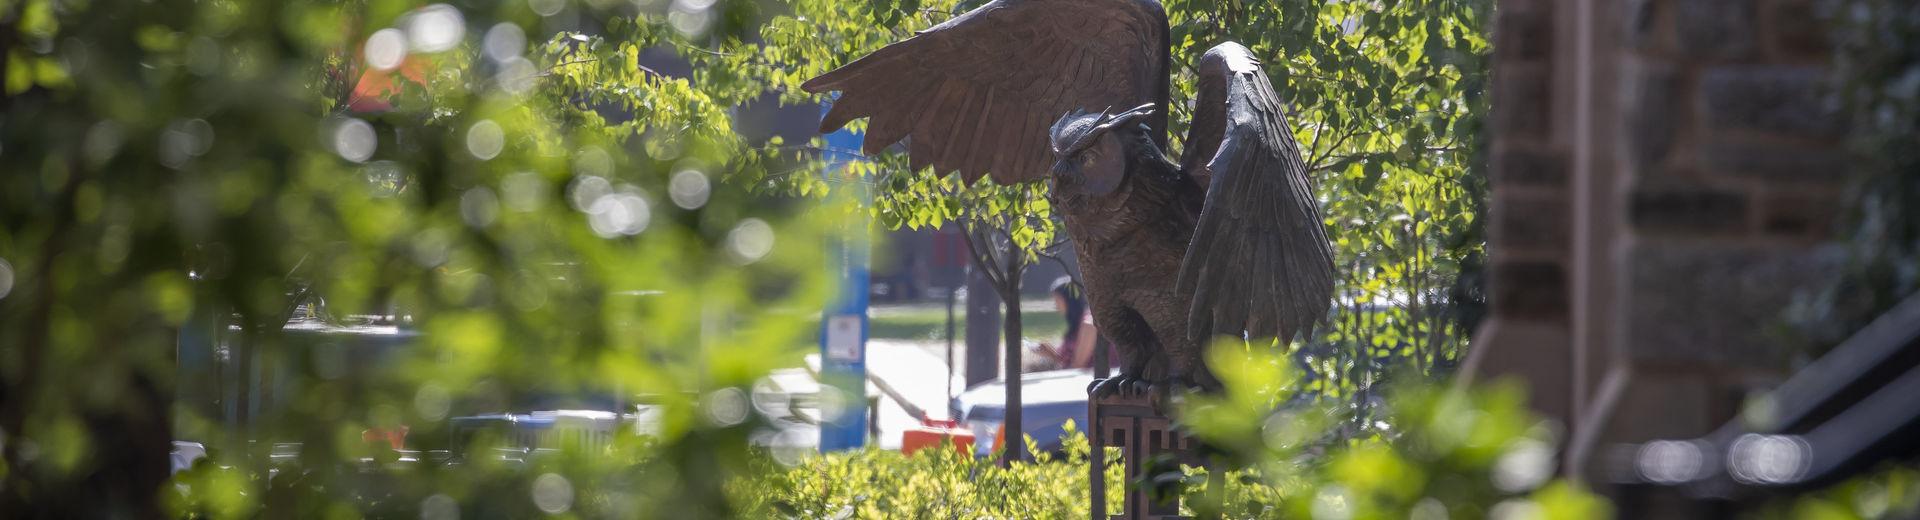 Temple University owl sculpture on Main Campus in Philadelphia